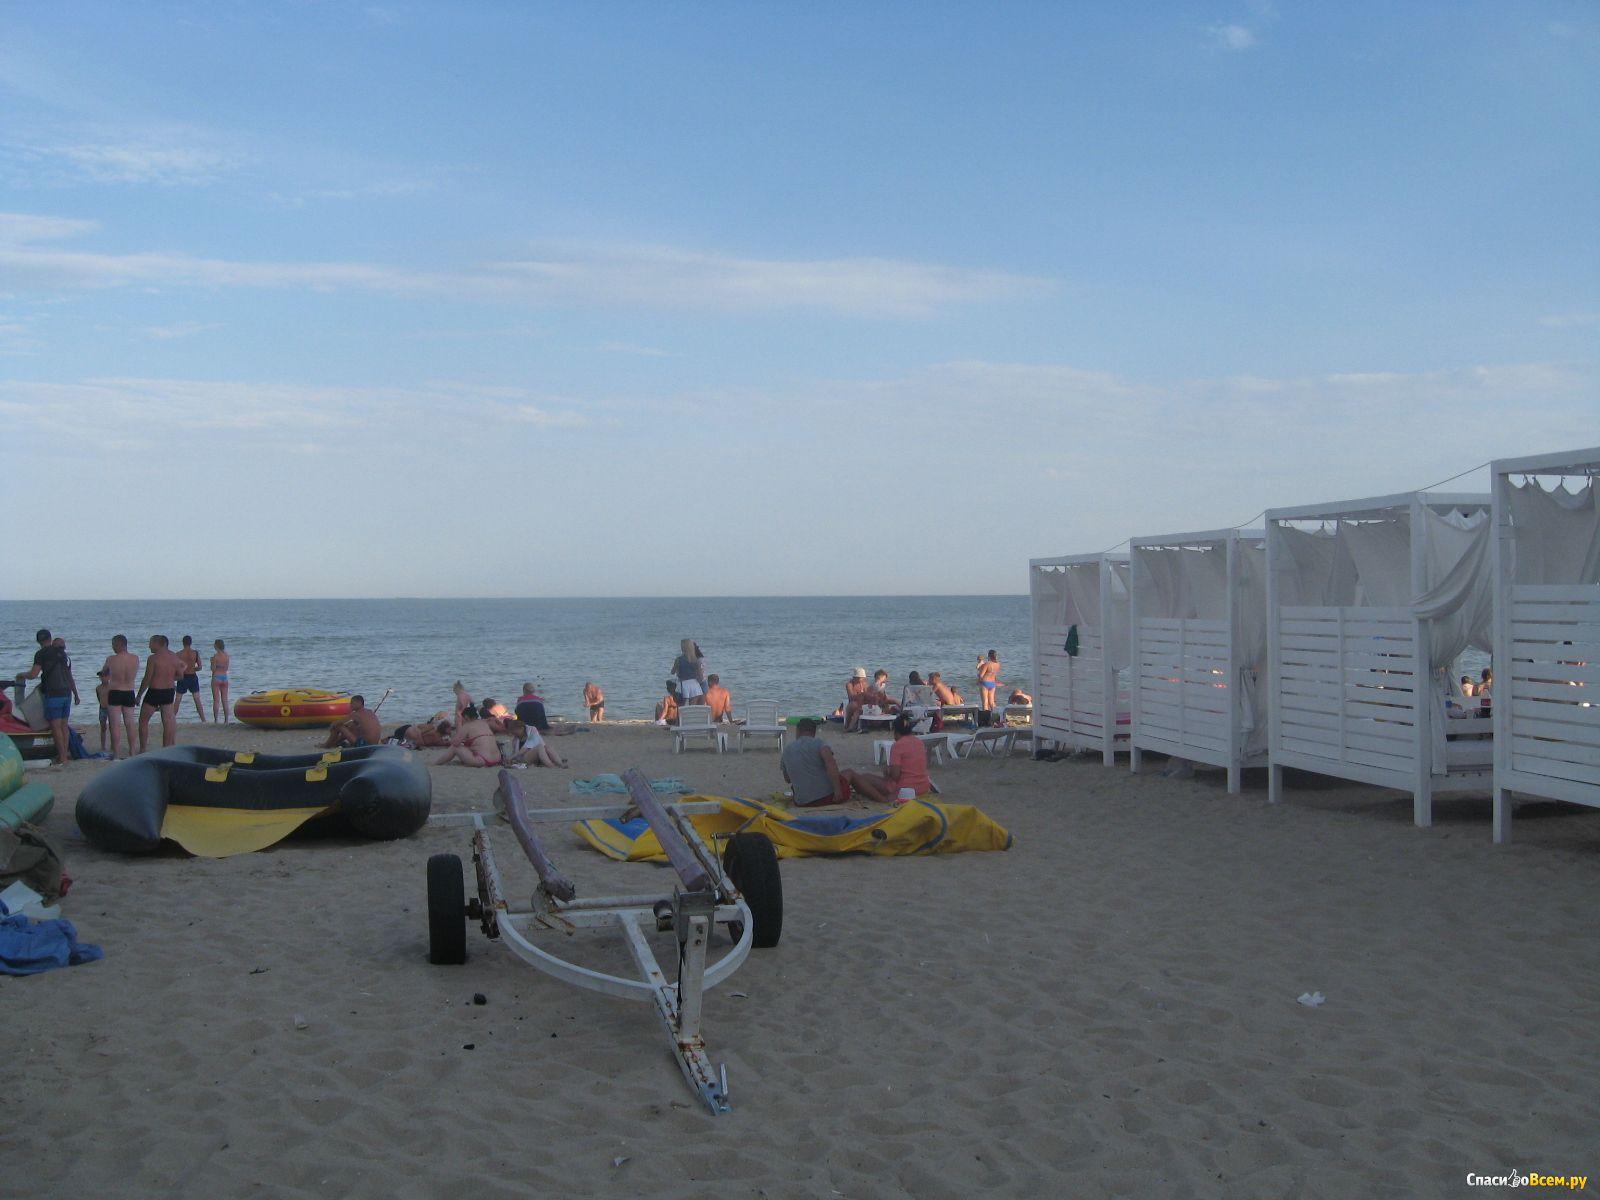 Затока украина фото пляжа и